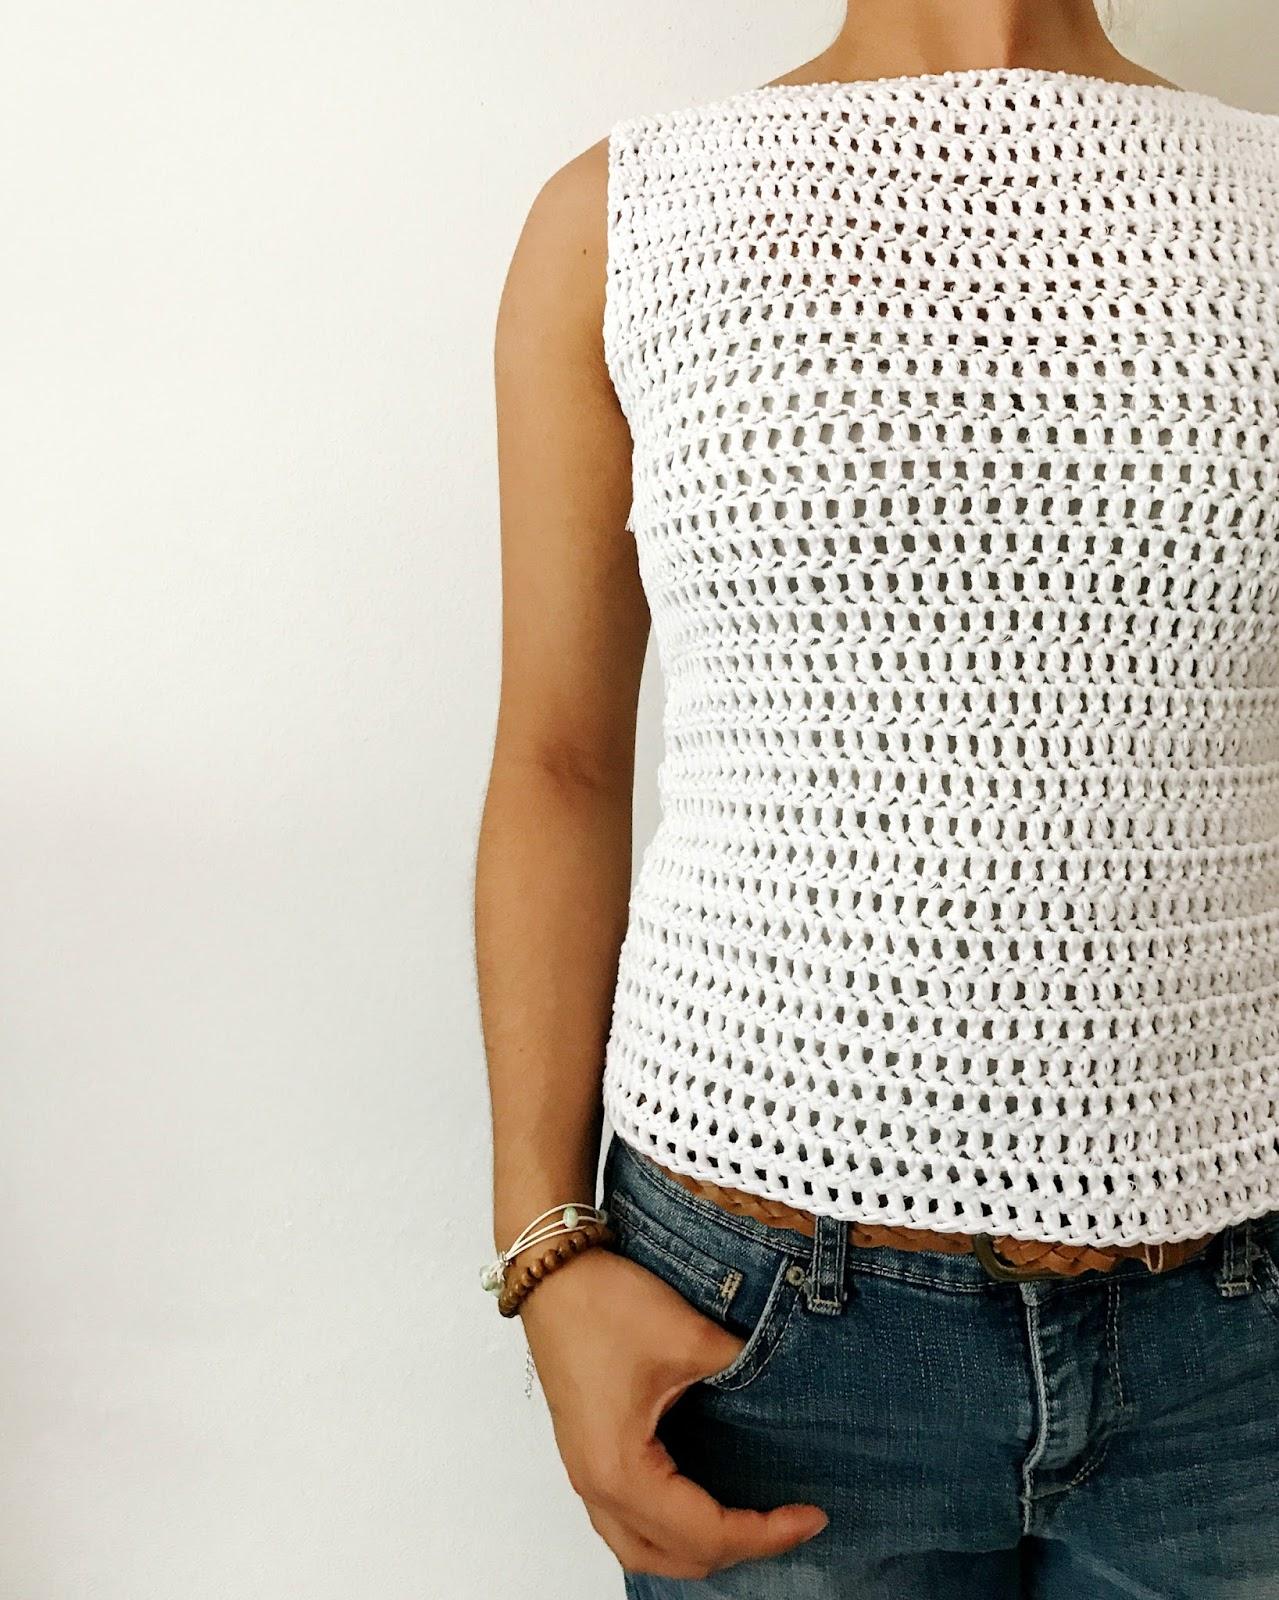 Brenna Ann Handmade: NEW Crochet Pattern - The Simple Spring Crochet Top